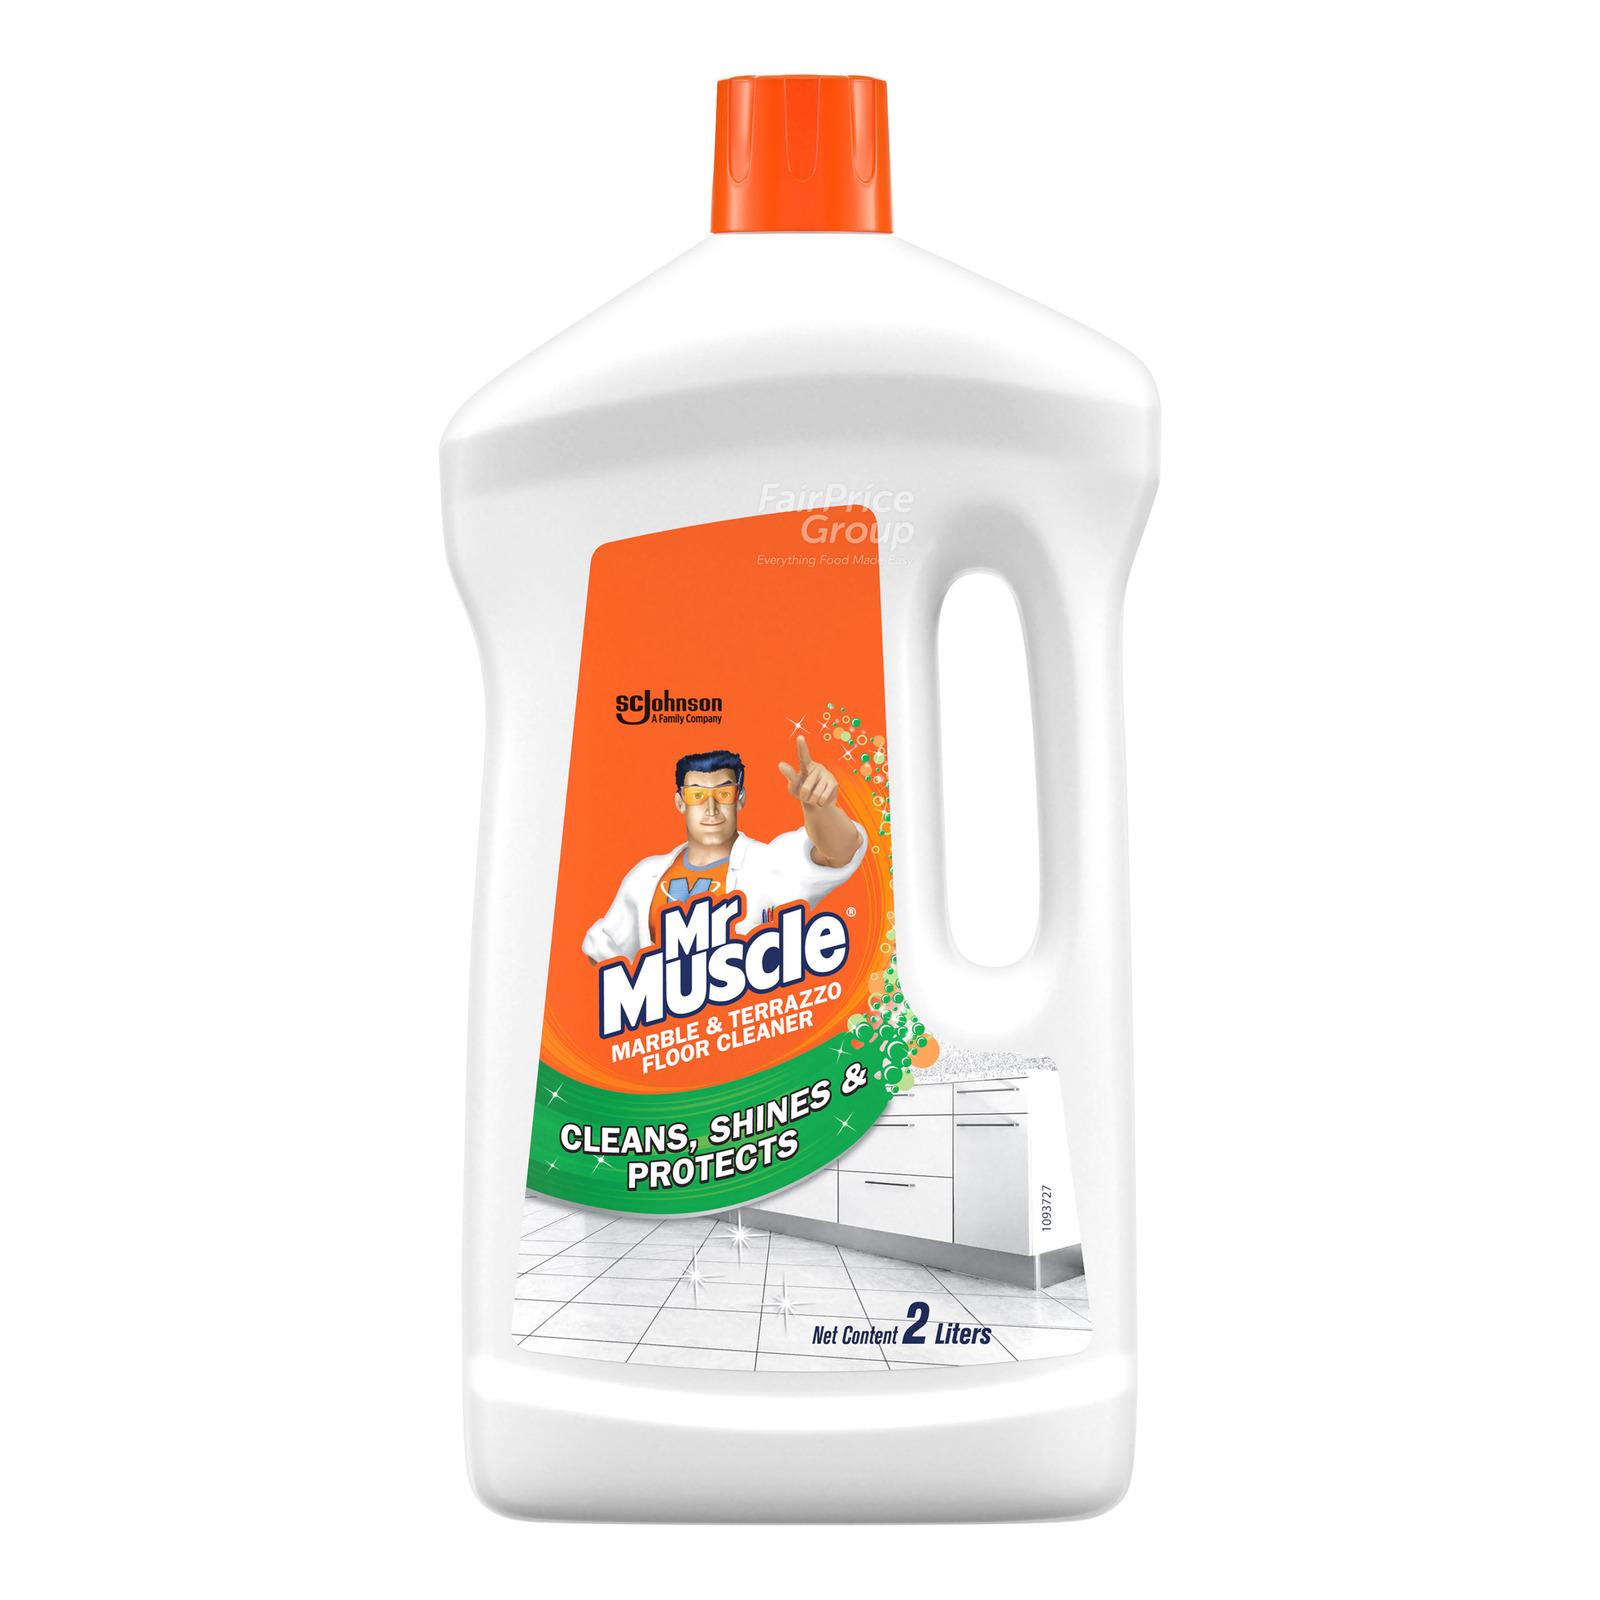 Mr Muscle 3 in 1 Floor Cleaner - Marble & Terrazzo